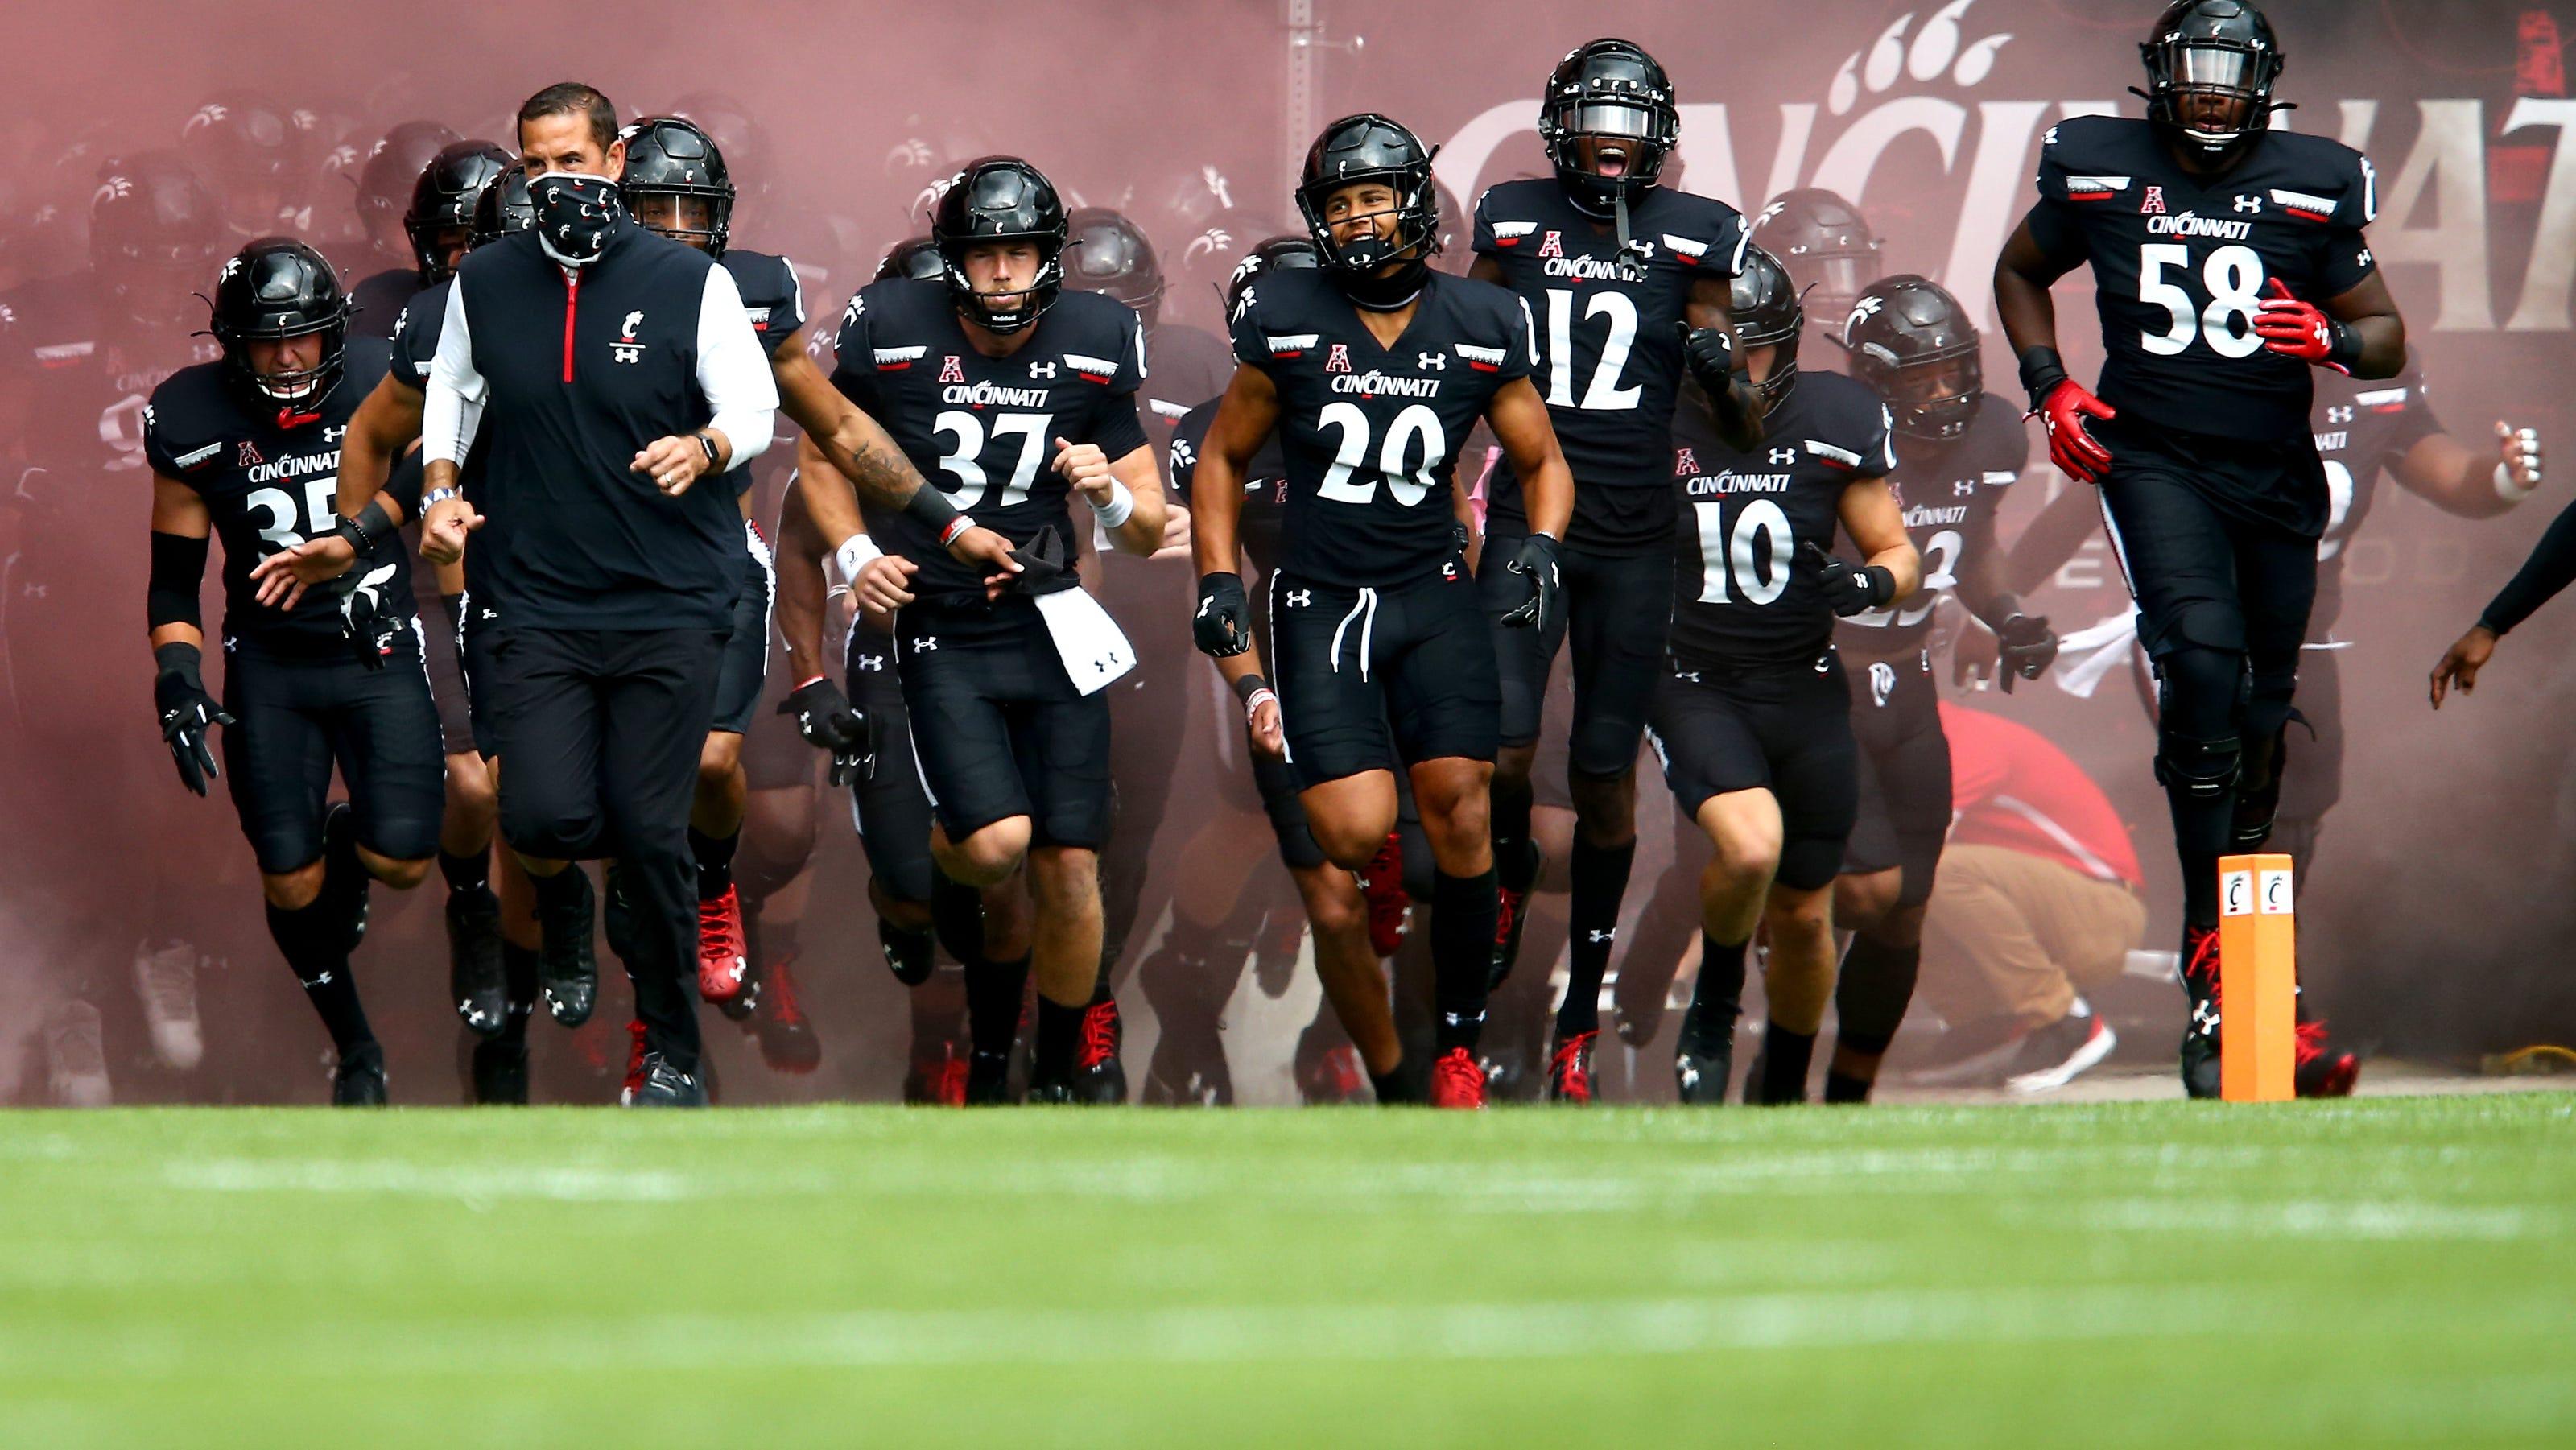 College football COVID-19 update: Cincinnati vs. Tulsa canceled